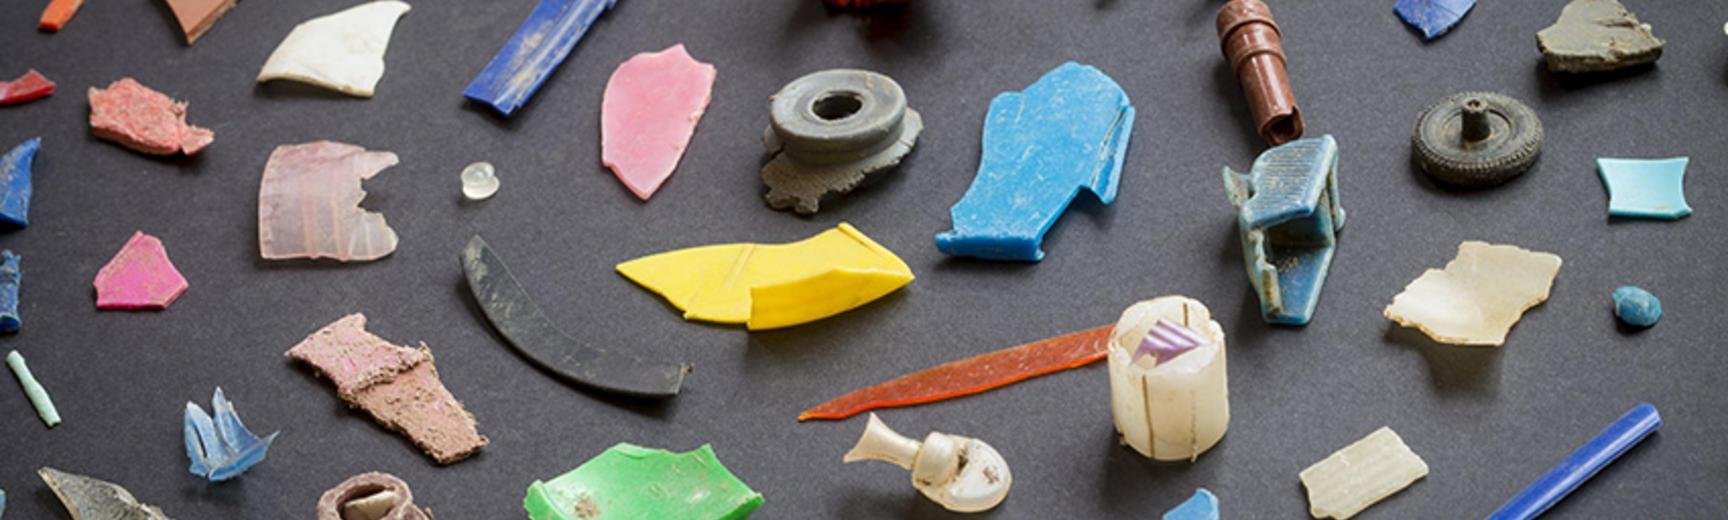 polymer diversity image